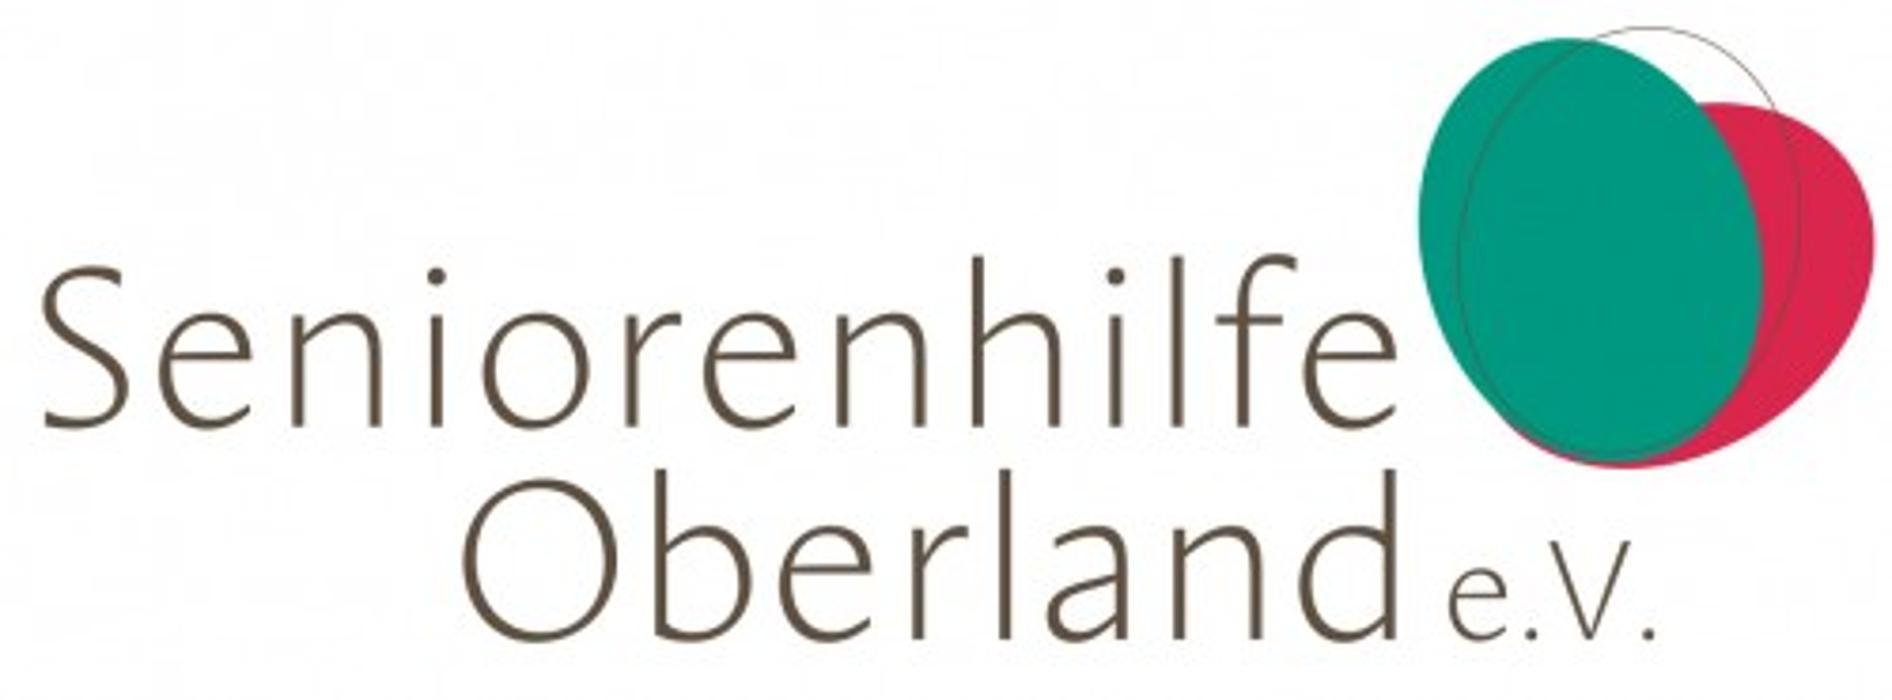 Seniorenhilfe Oberland e.V.